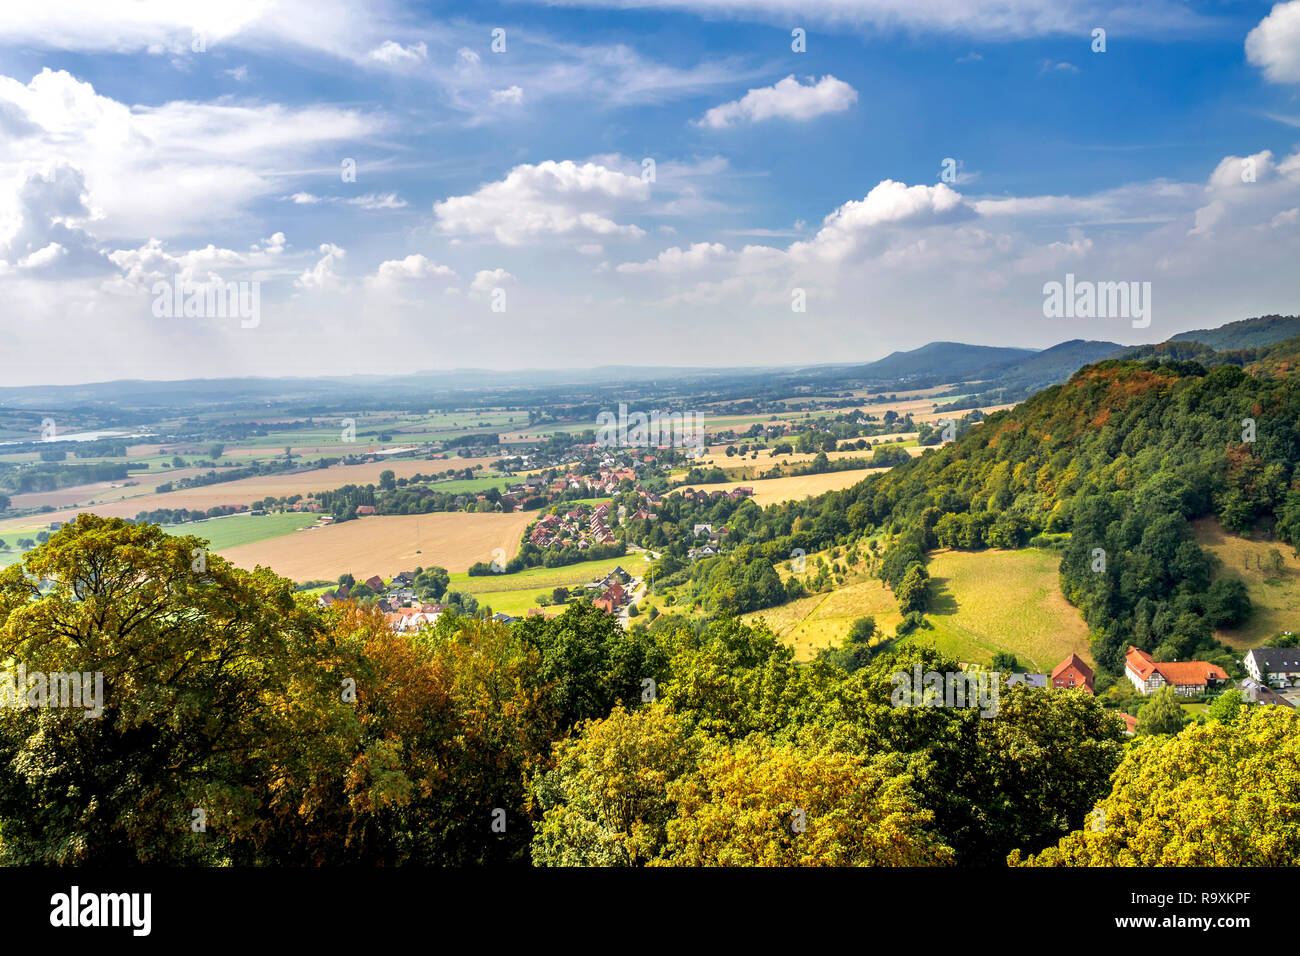 Schaumburg, Rinteln, Castle - Stock Image